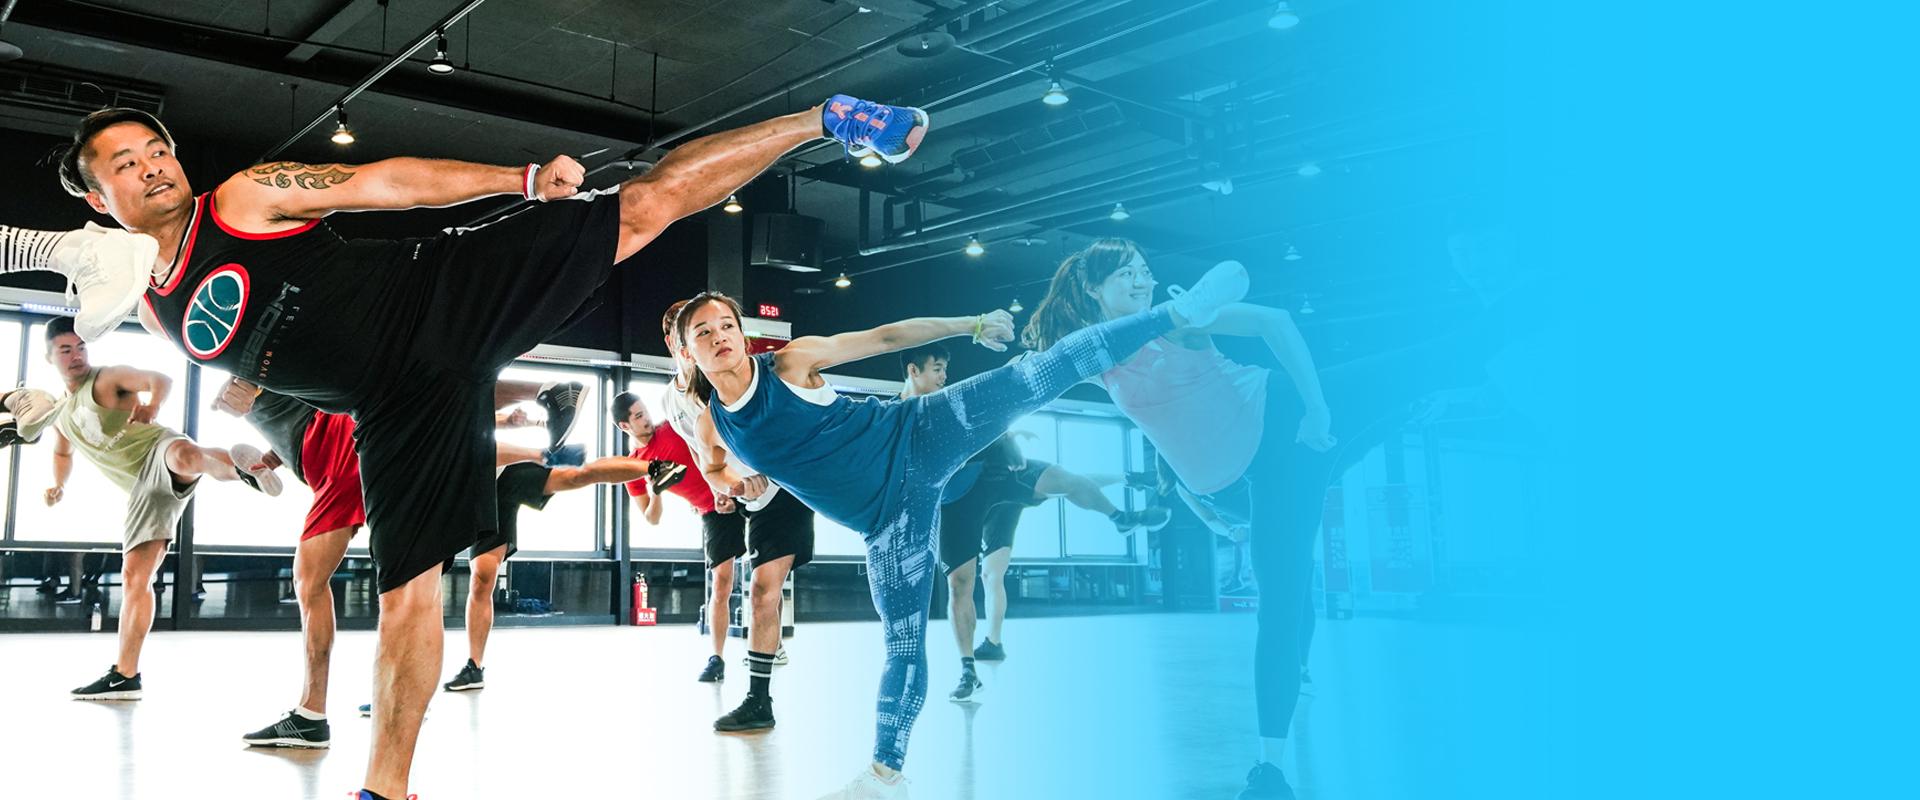 World Gym世界健身有氧老師介紹